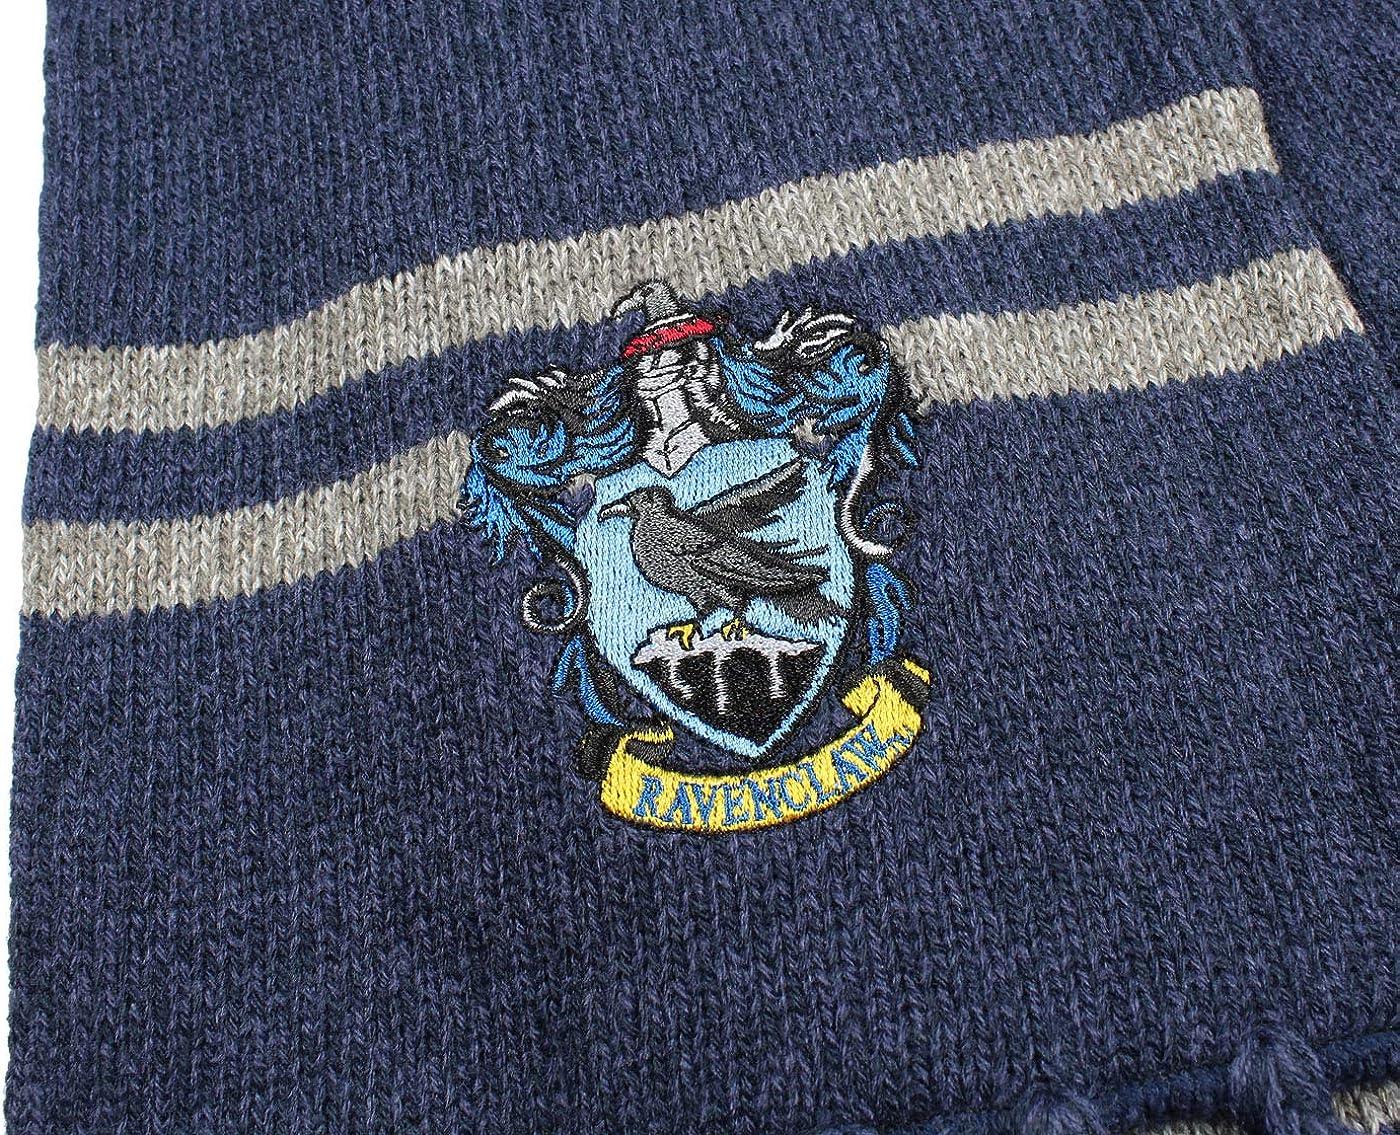 Harry Potter Hogwarts Houses Knit Ravenclaw Scarf & Pom Beanie Set (Ravenclaw): Clothing